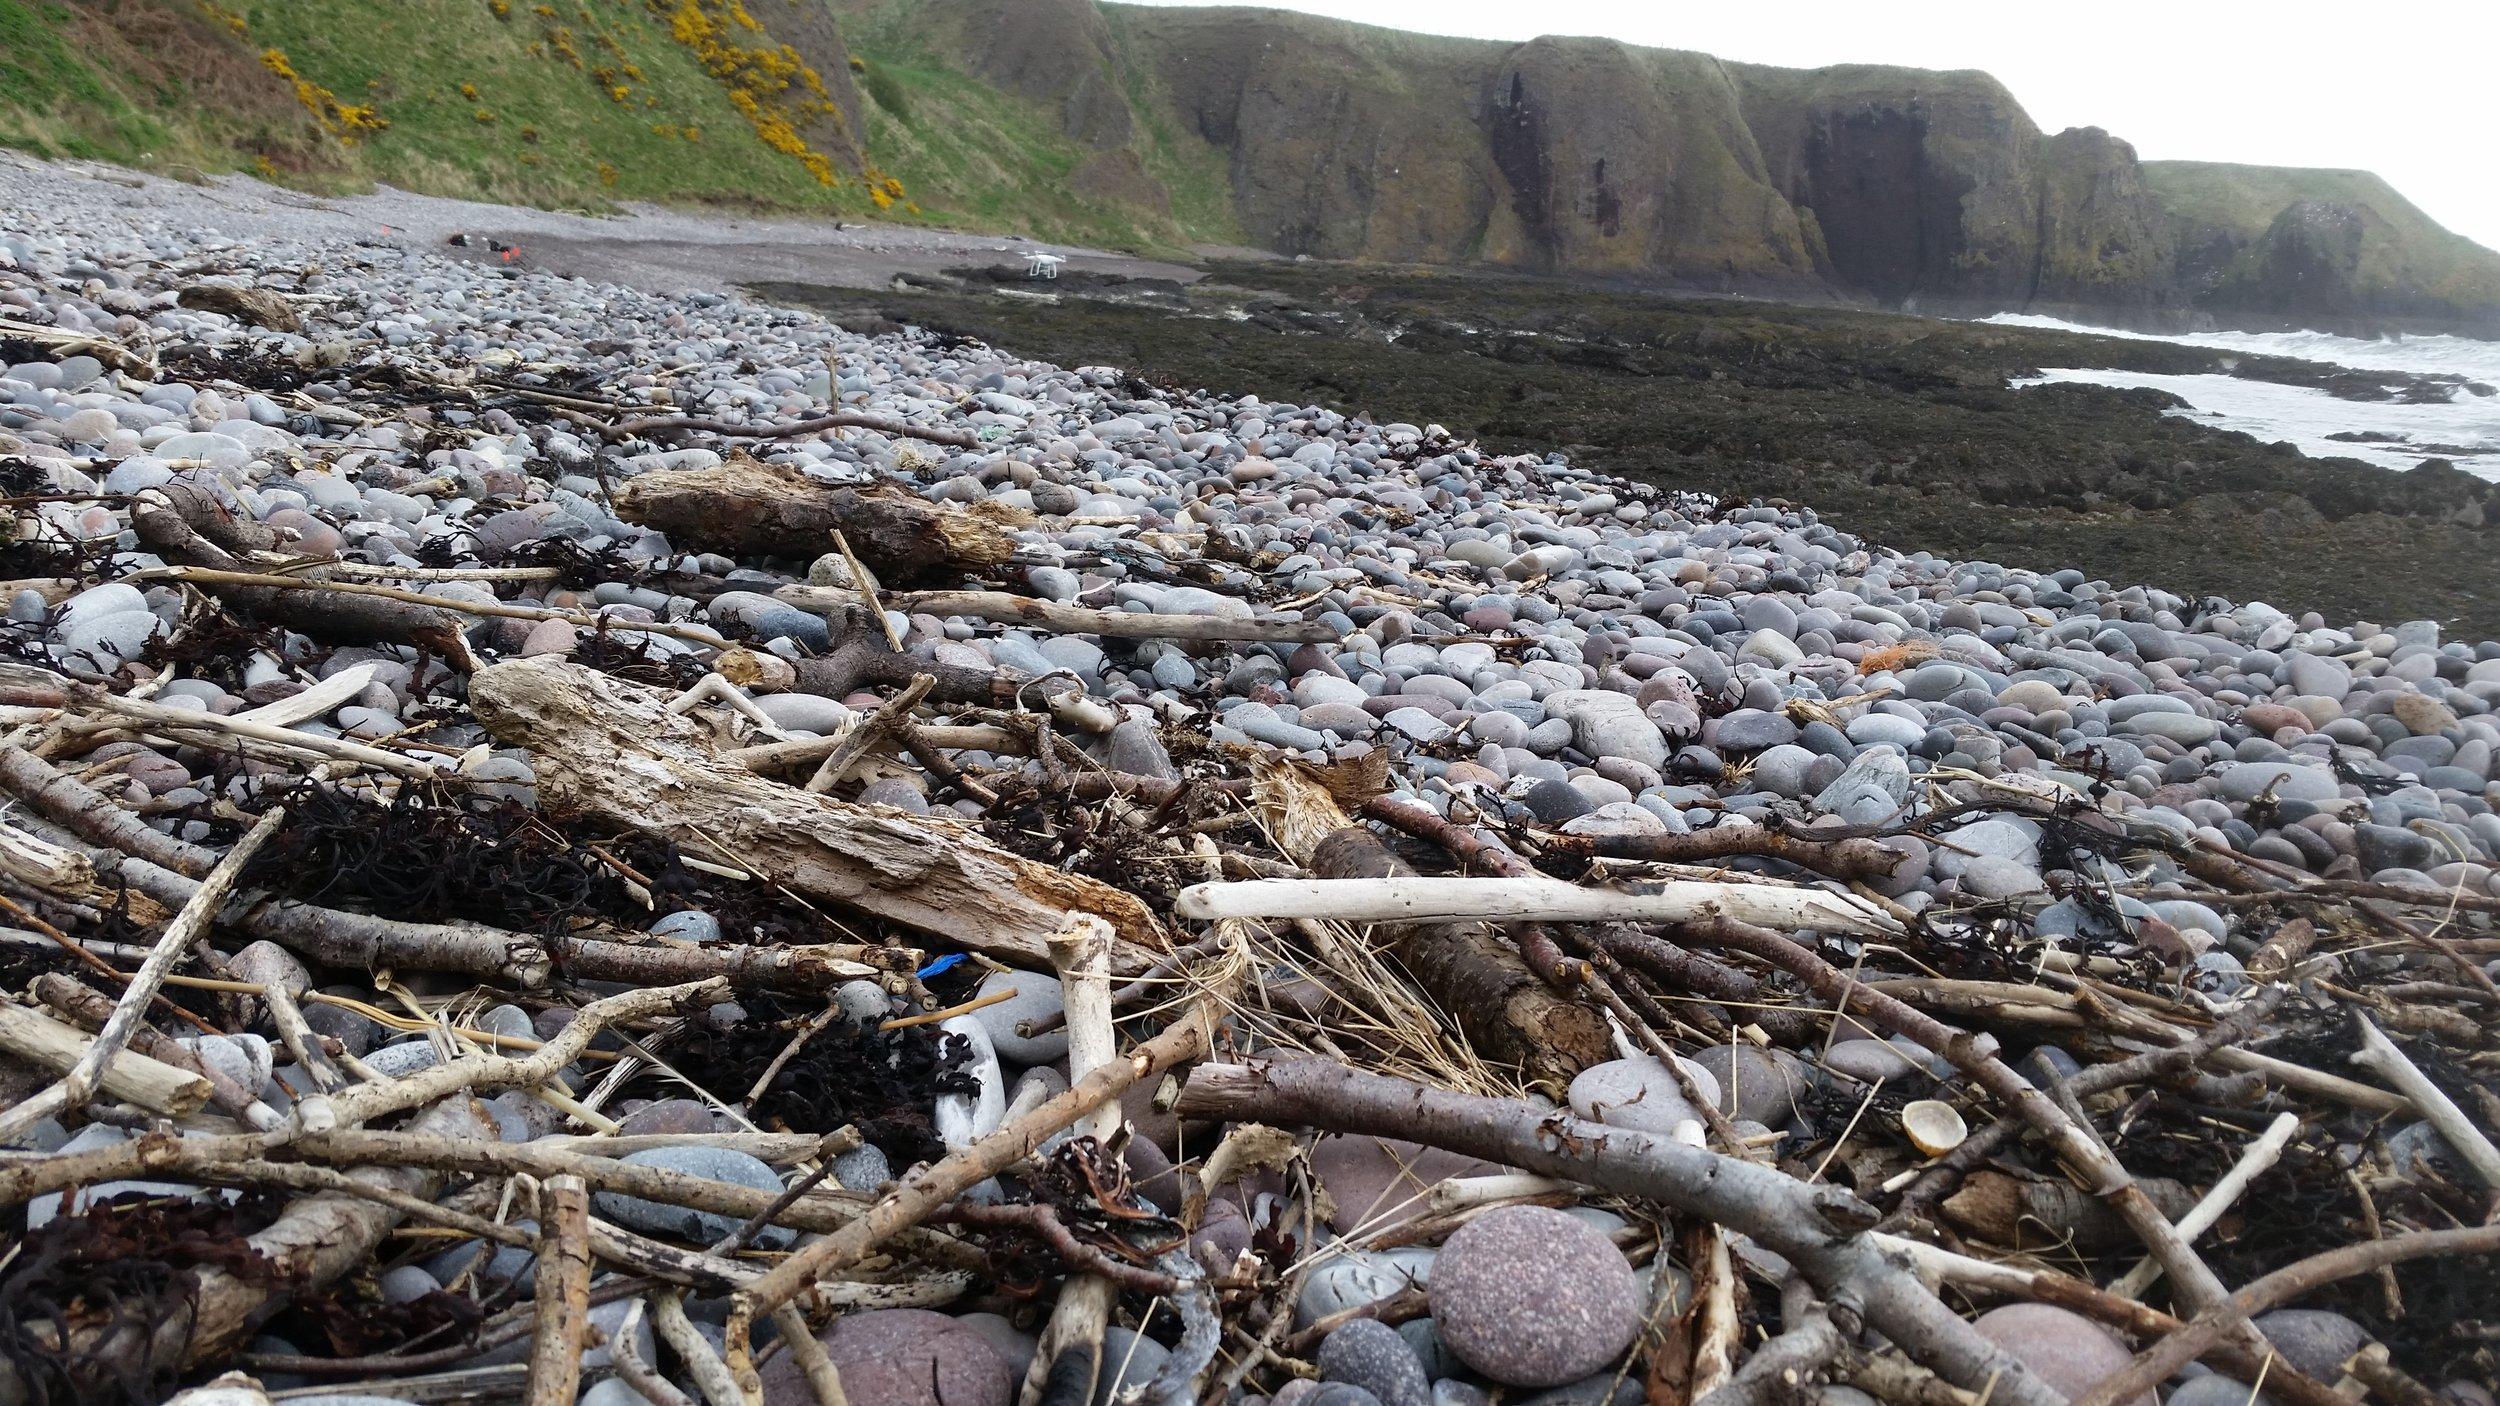 Plastic debris trapped along the strandline in the prison like valley.